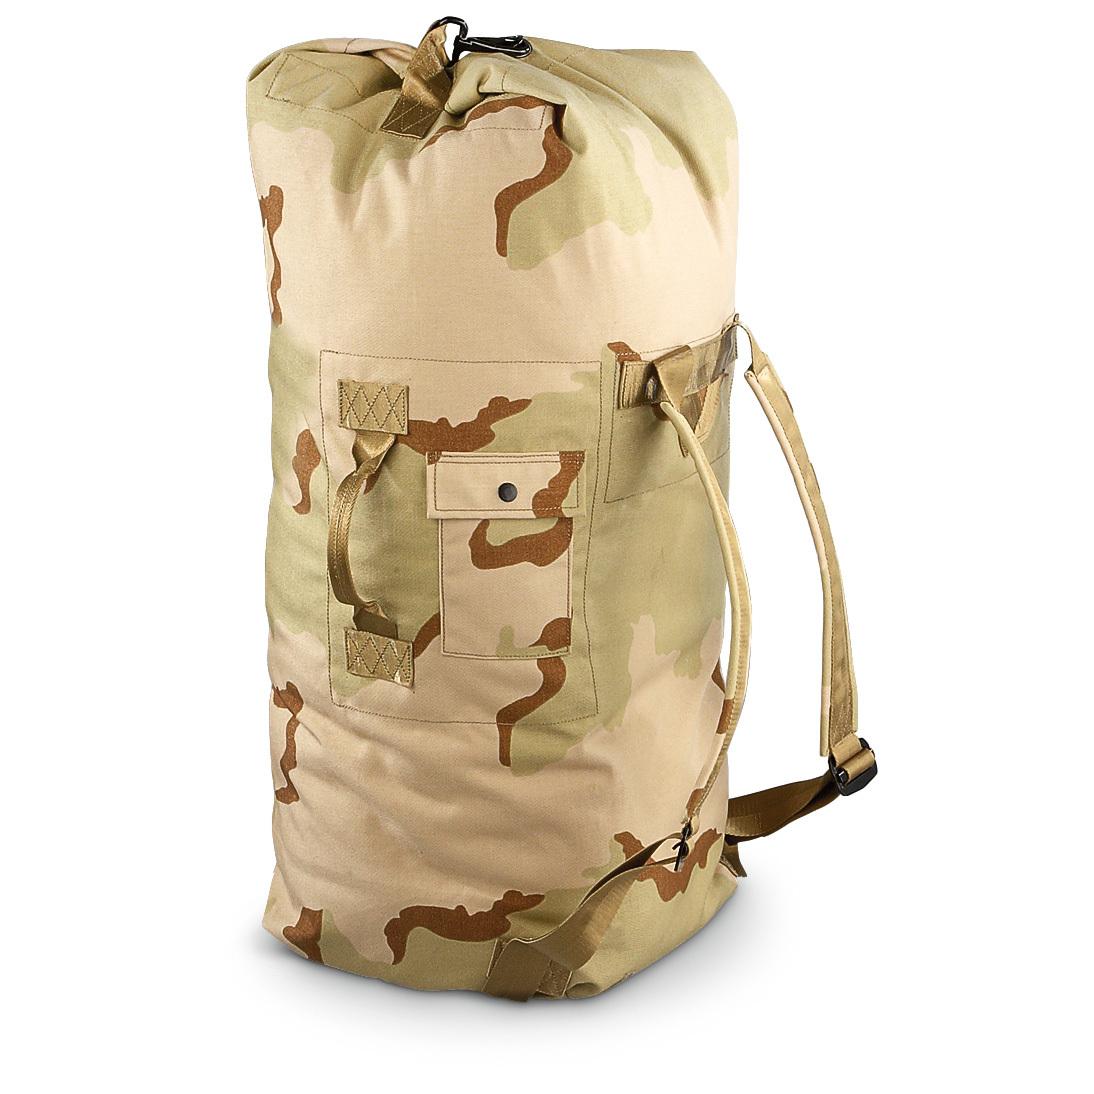 New U.S. Military Surplus Fire-resistant Duffel Bag Deser... - Thrill On cb6e0b62b52bb